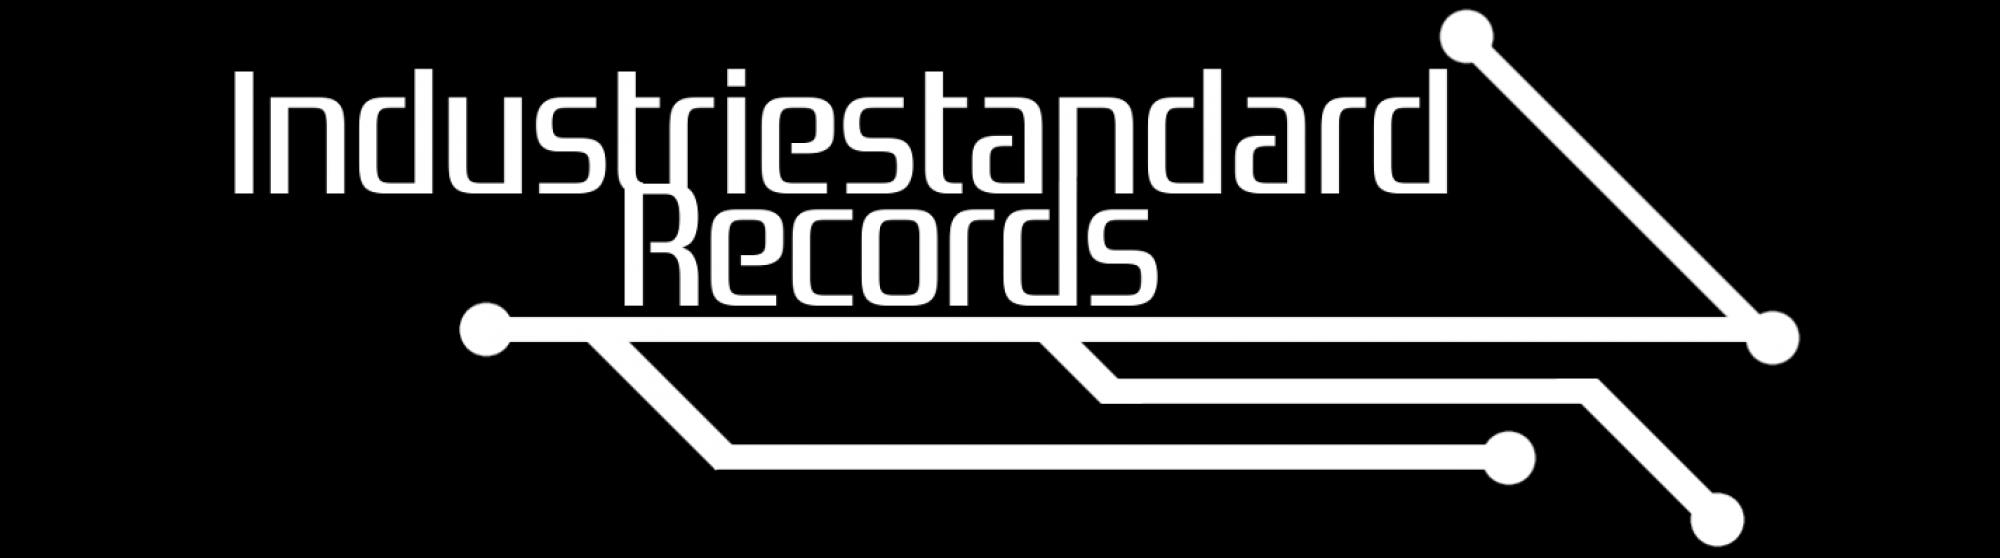 Industriestandard Records